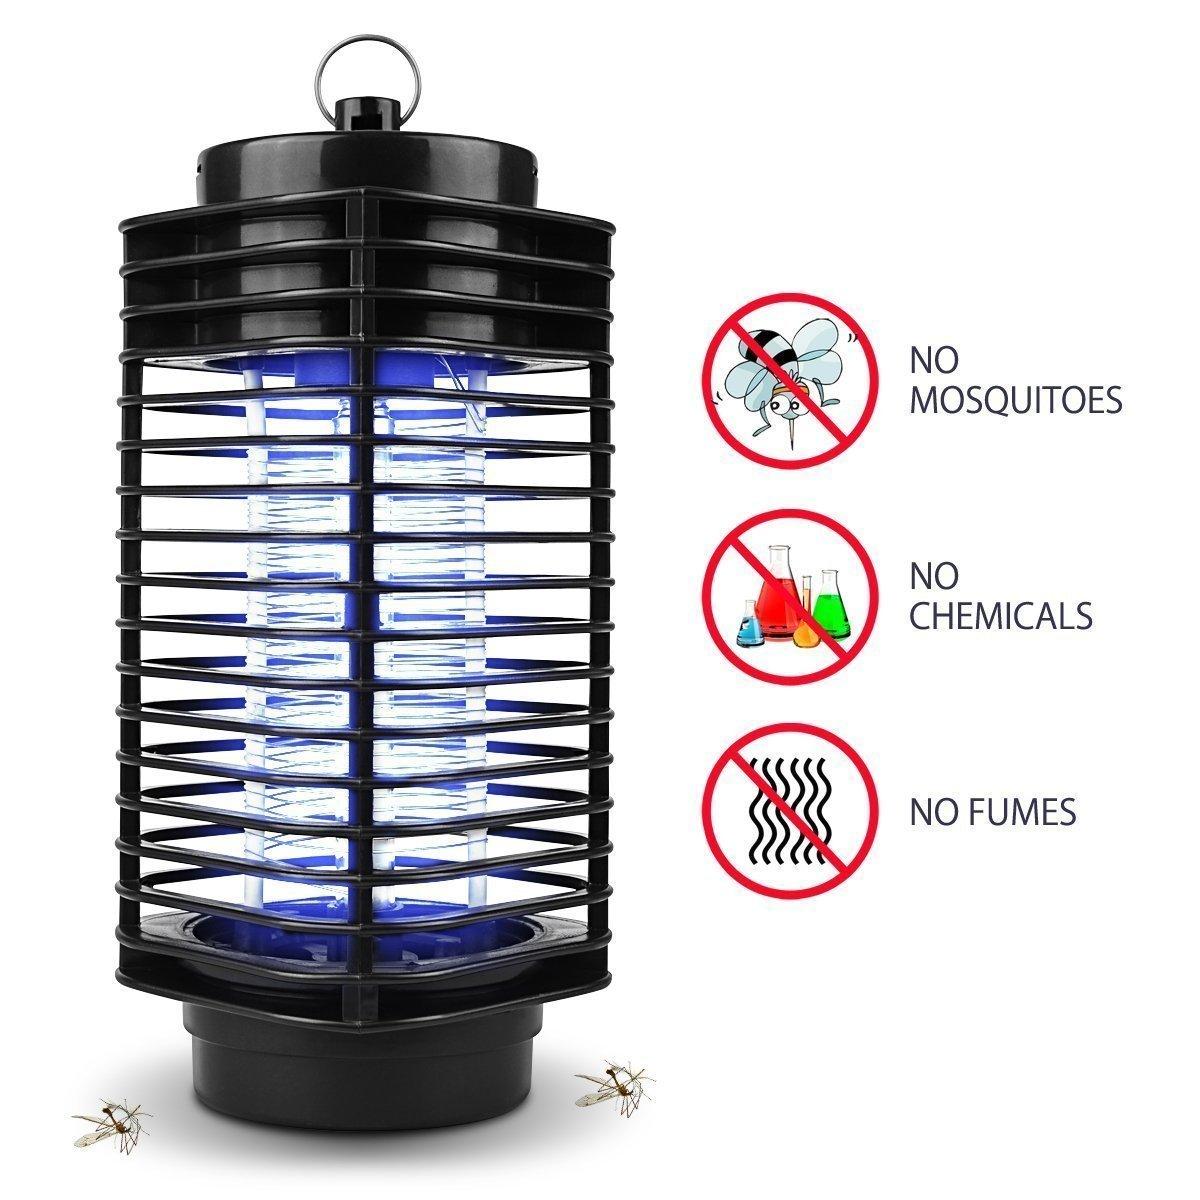 Maxineer Electrónico Lámpara Antimosquitos Interior,Lámpara de Mosquitos Electrónica Lámpara Anti-Mosquitos/Anti-Insectos Mata Trampa Mosquitos con Luz UV ...